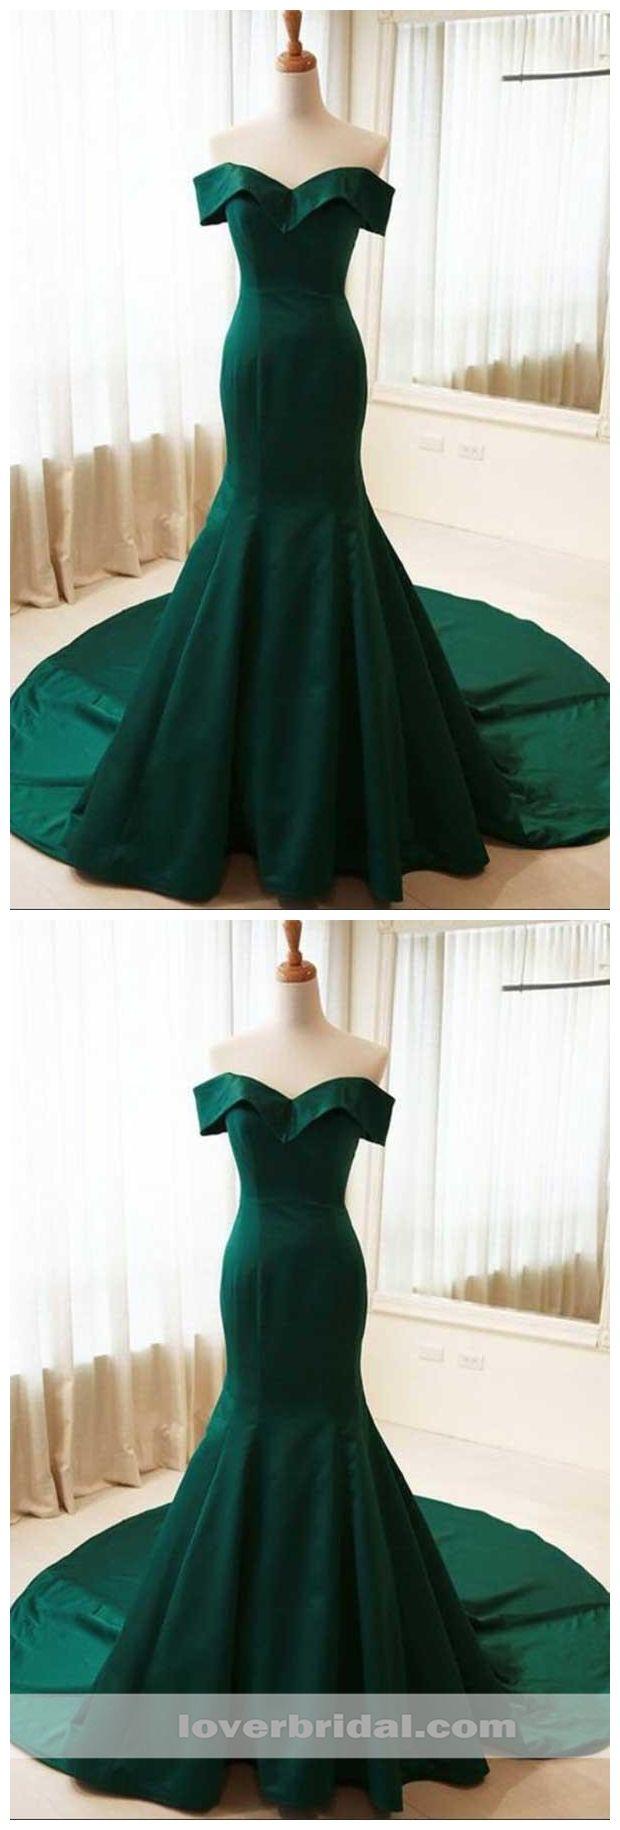 Simple emerald green mermaid long evening prom dresses cheap sweet